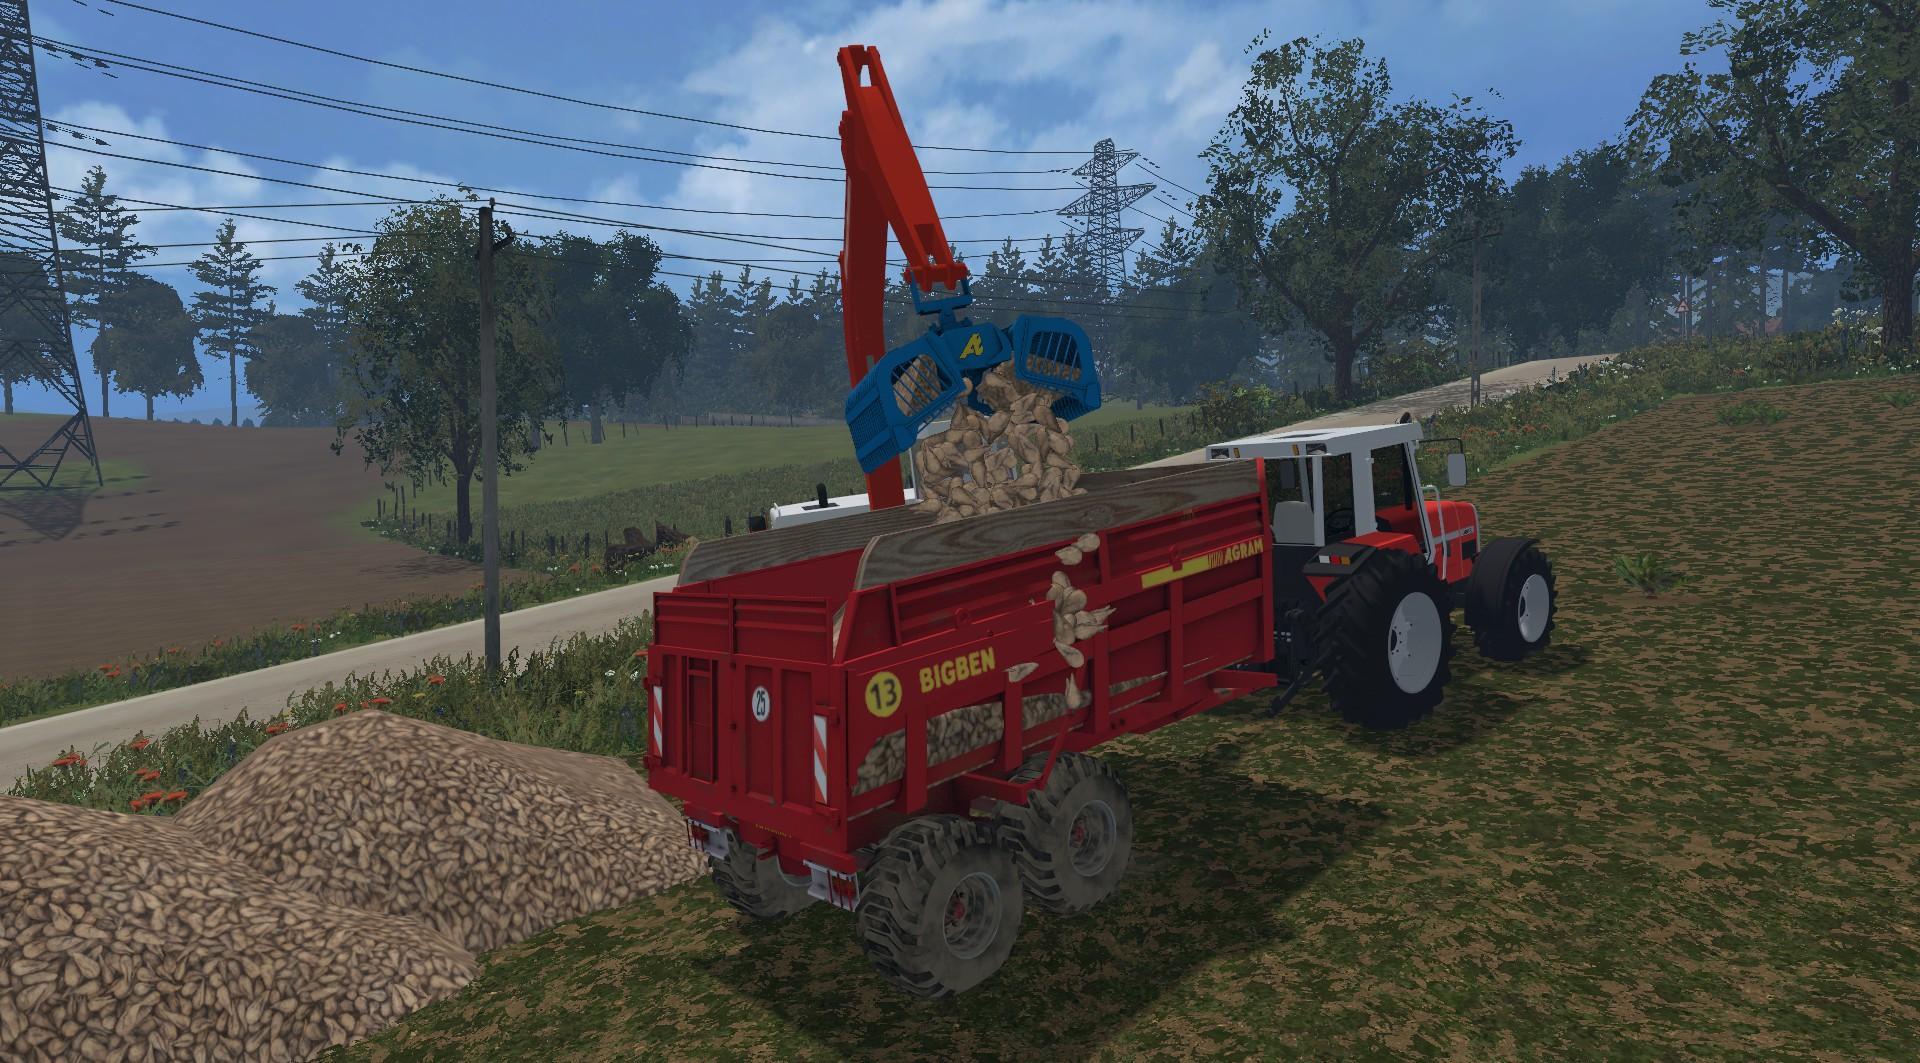 Godet Betterave v0 9 Beta - Farming simulator modification